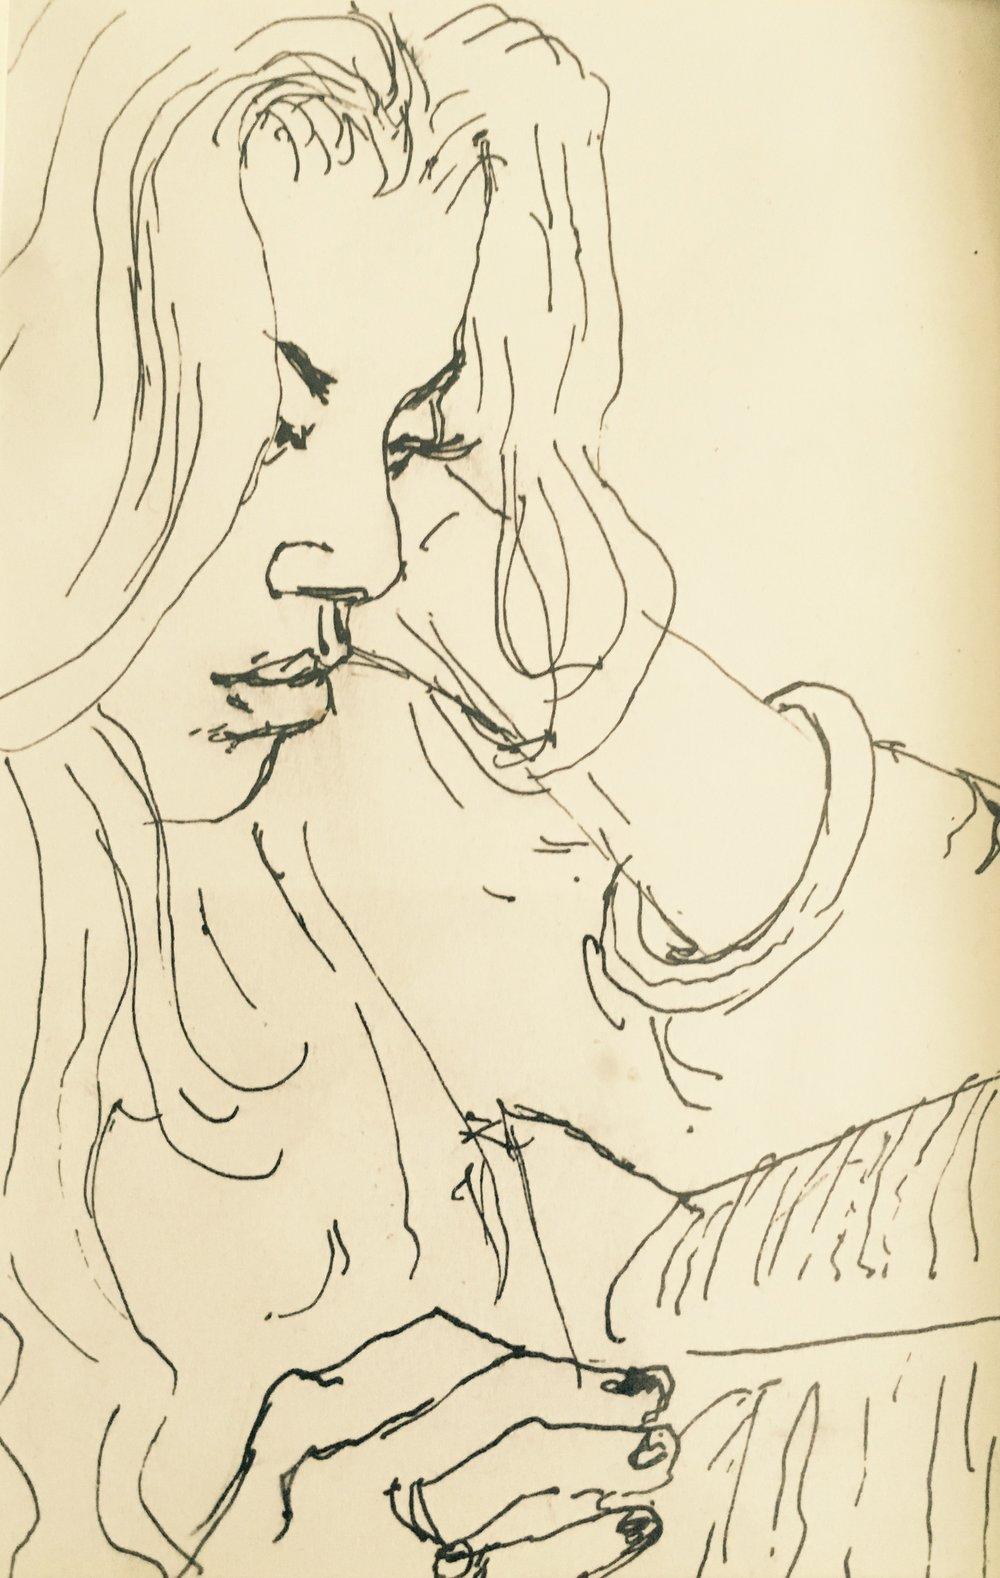 FIVE MINUTE SKETCH by Noah Hilsenrad [moleskine, ink], 2013